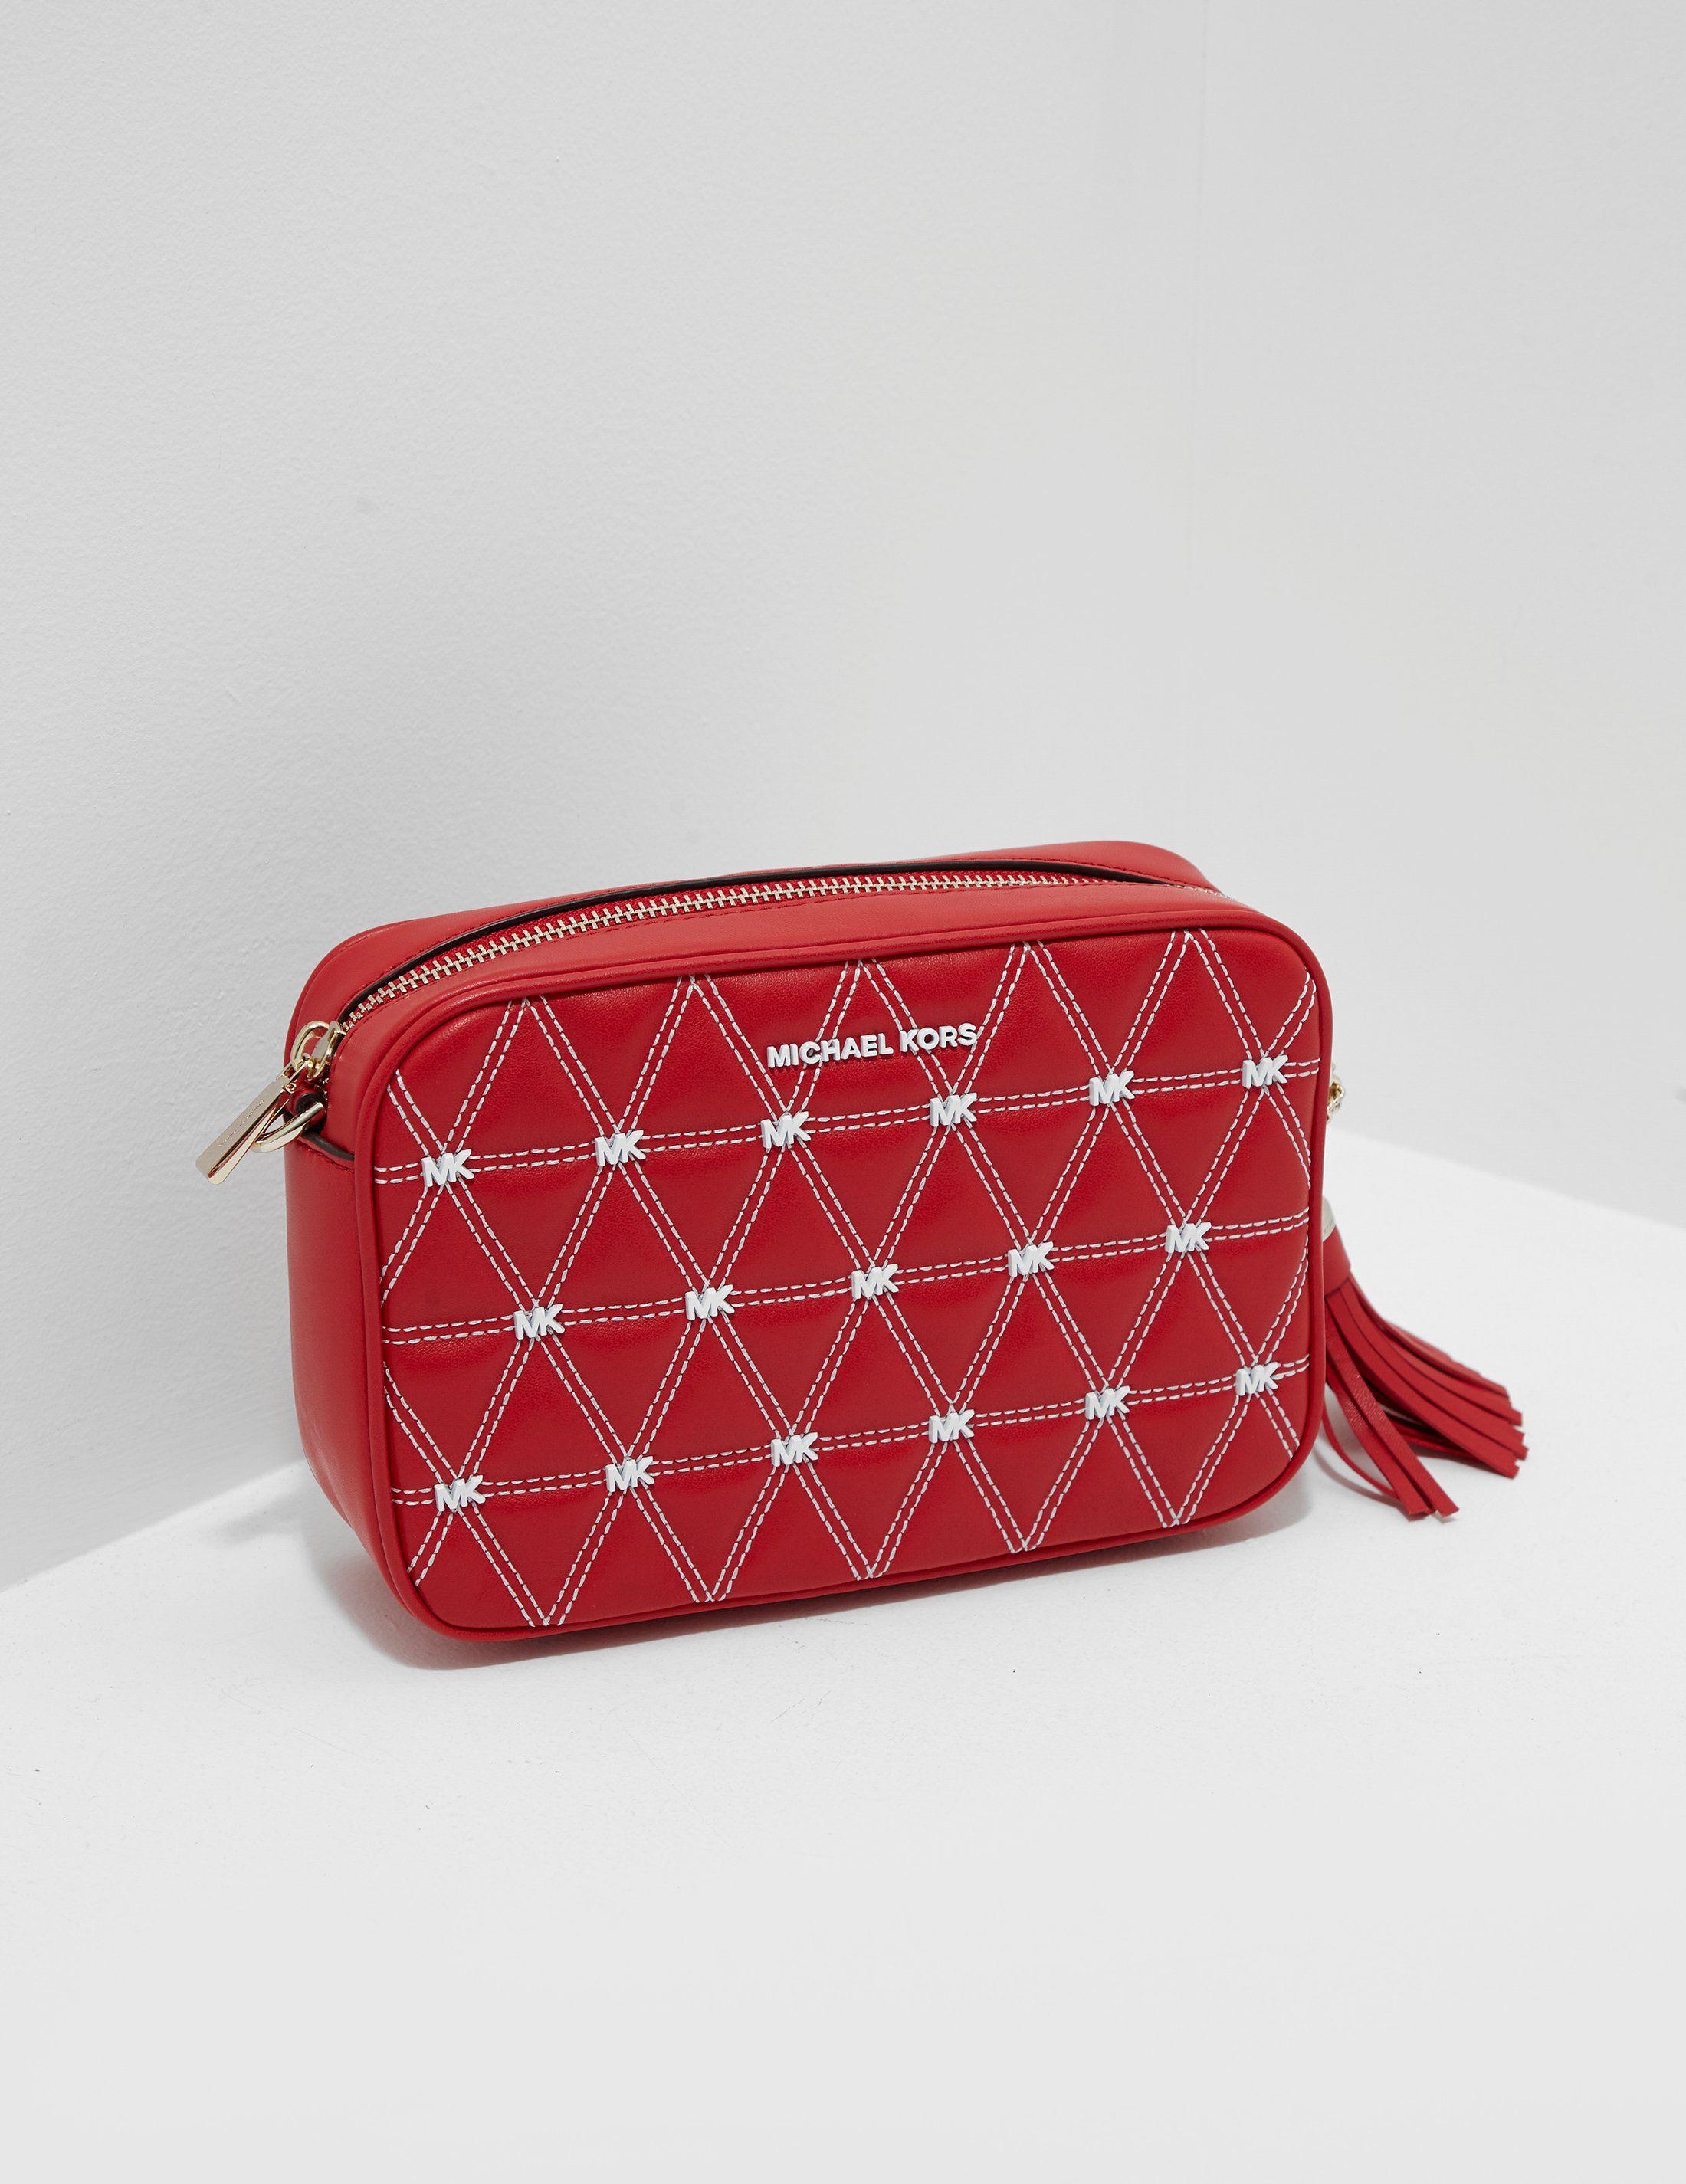 Michael Kors Camera Bag - Online Exclusive